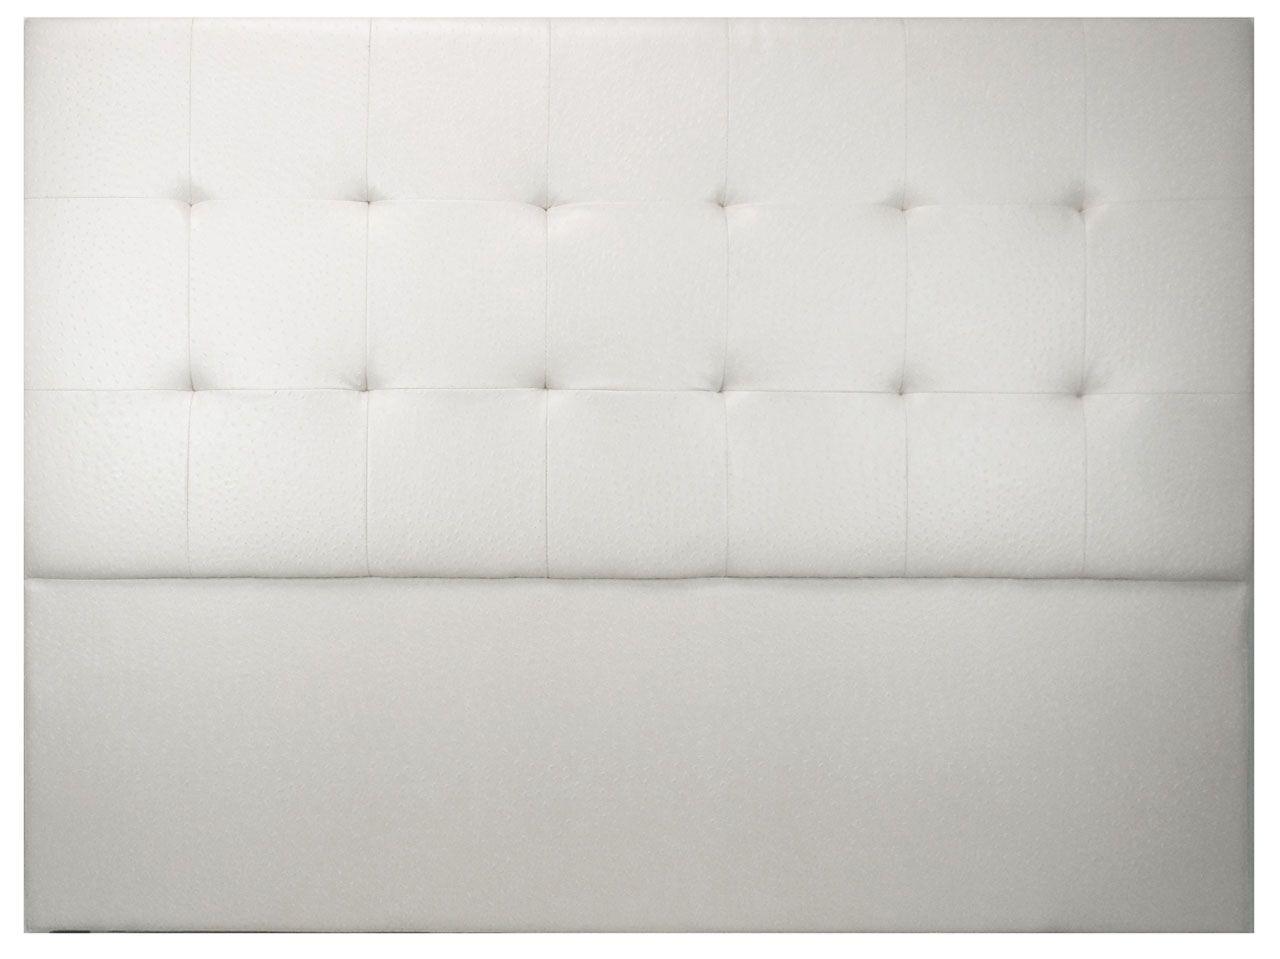 t te de lit capitonn e tudor aspect autruche blanc 140. Black Bedroom Furniture Sets. Home Design Ideas